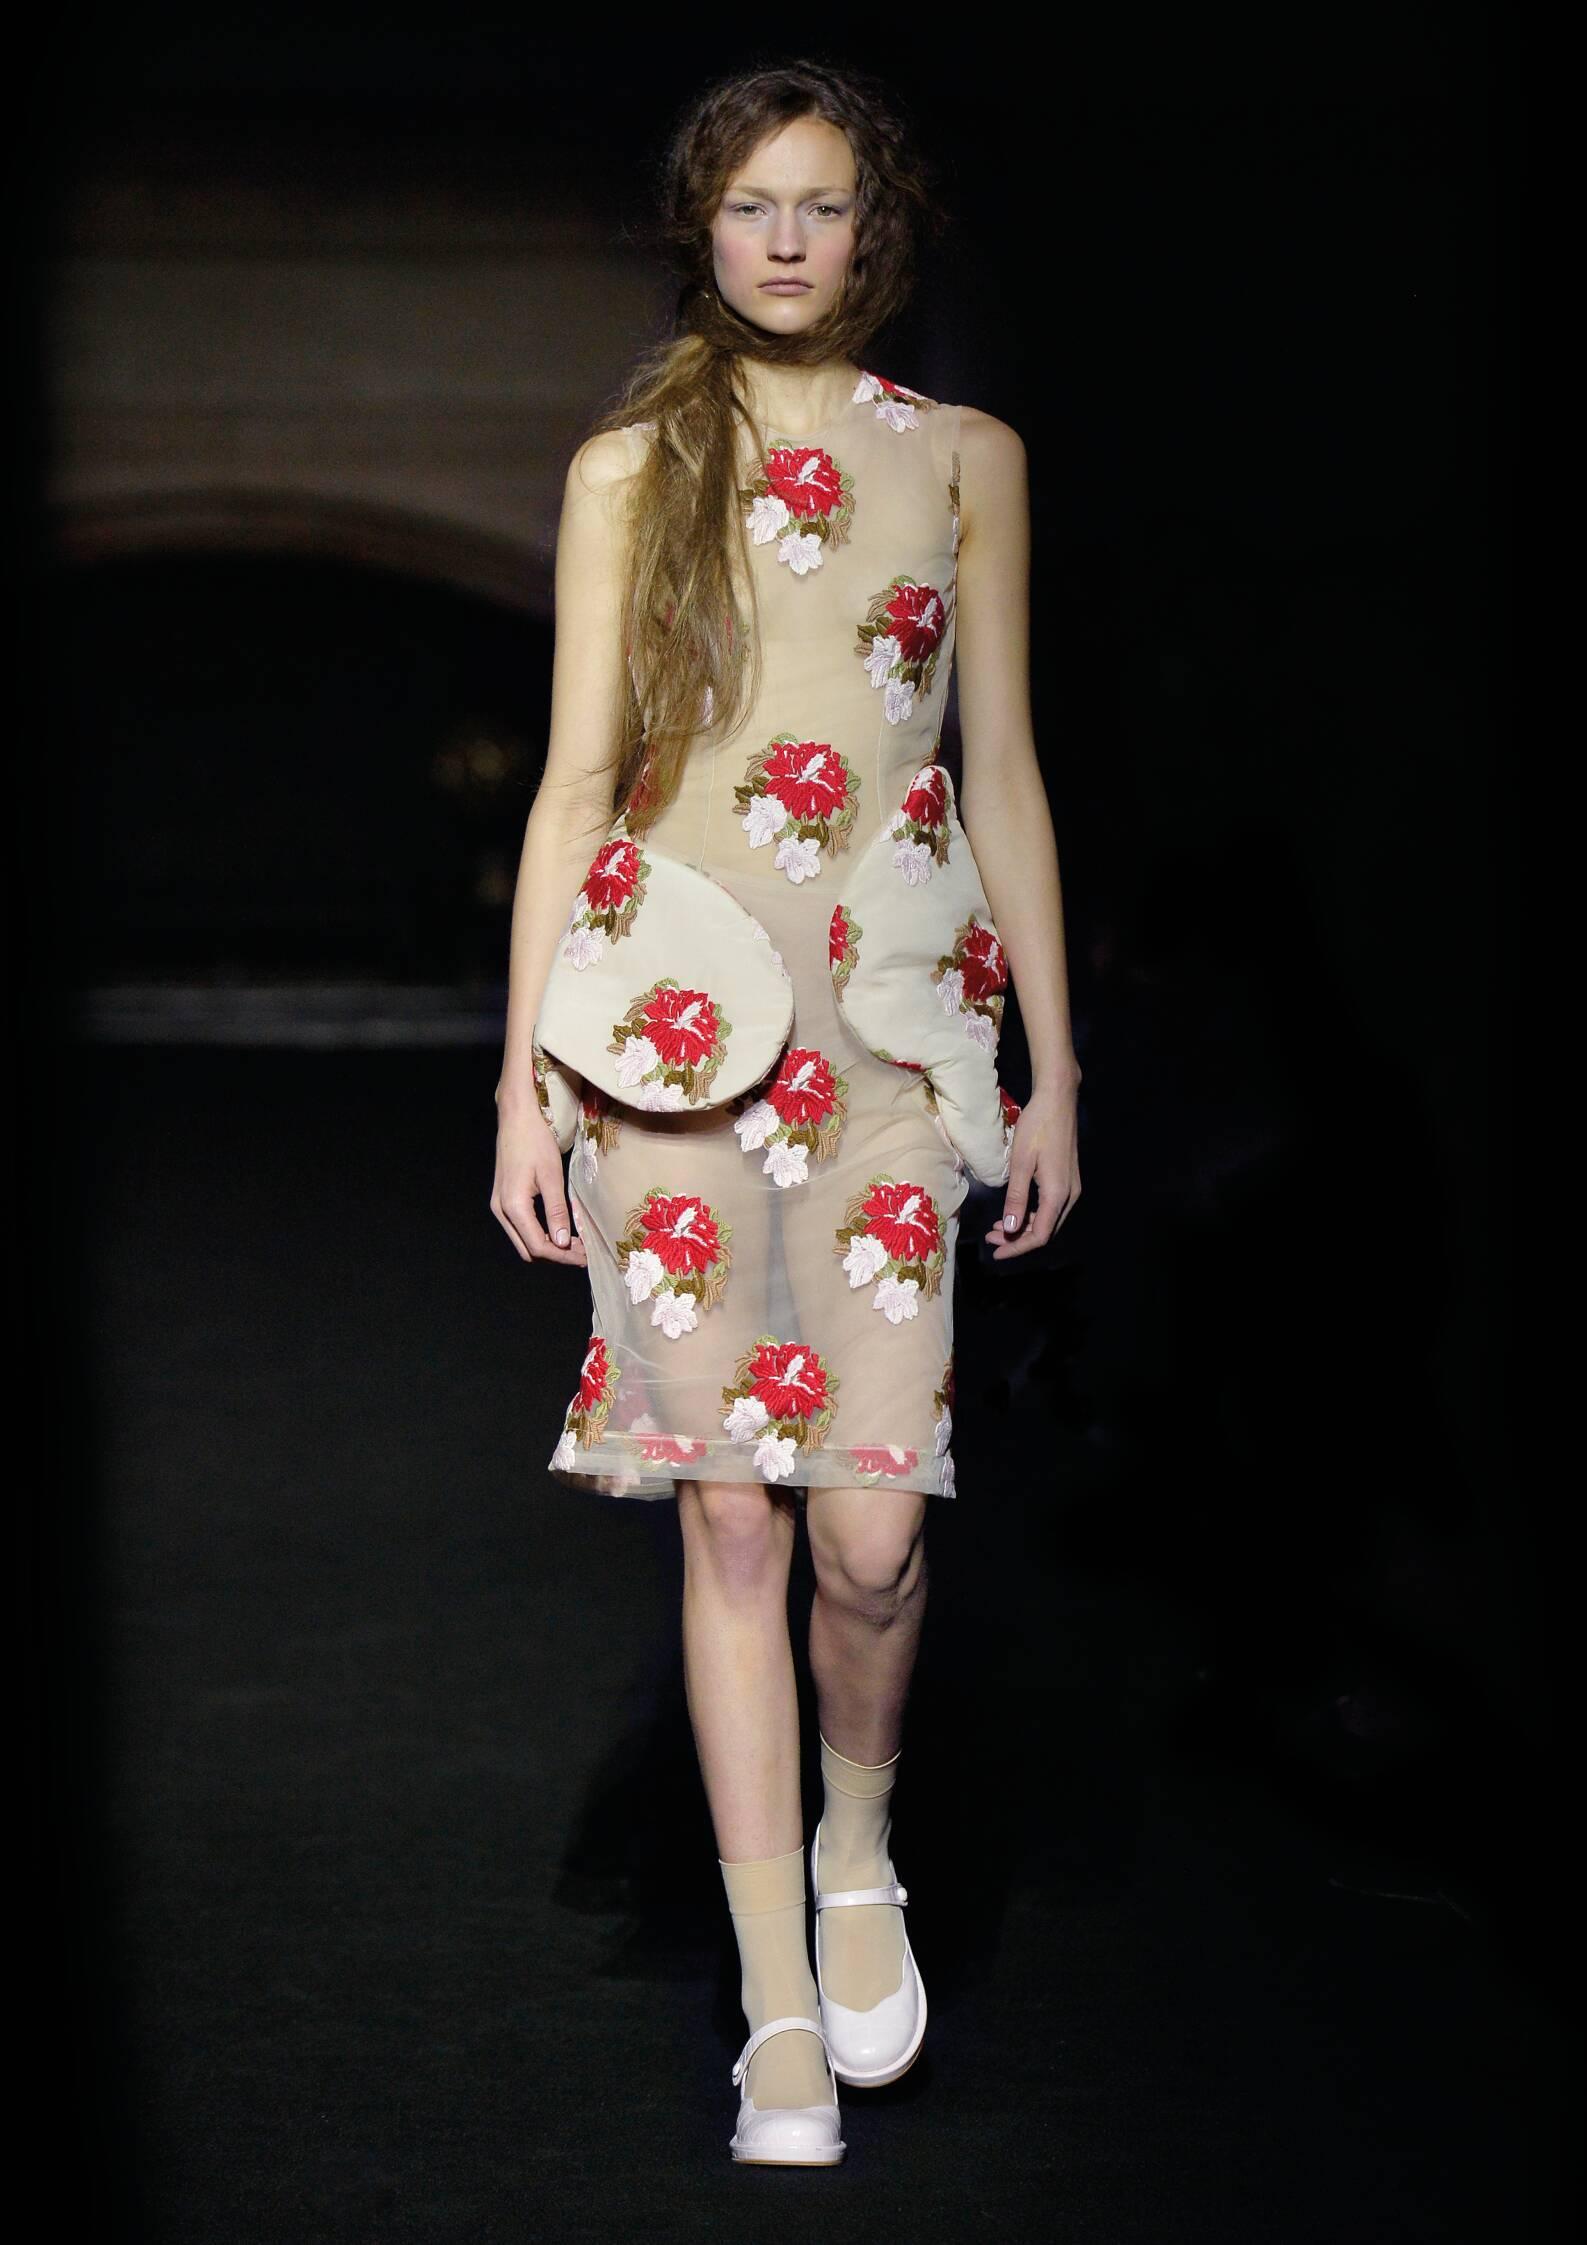 Simone Rocha Collection Fashion Show FW 2015 2016